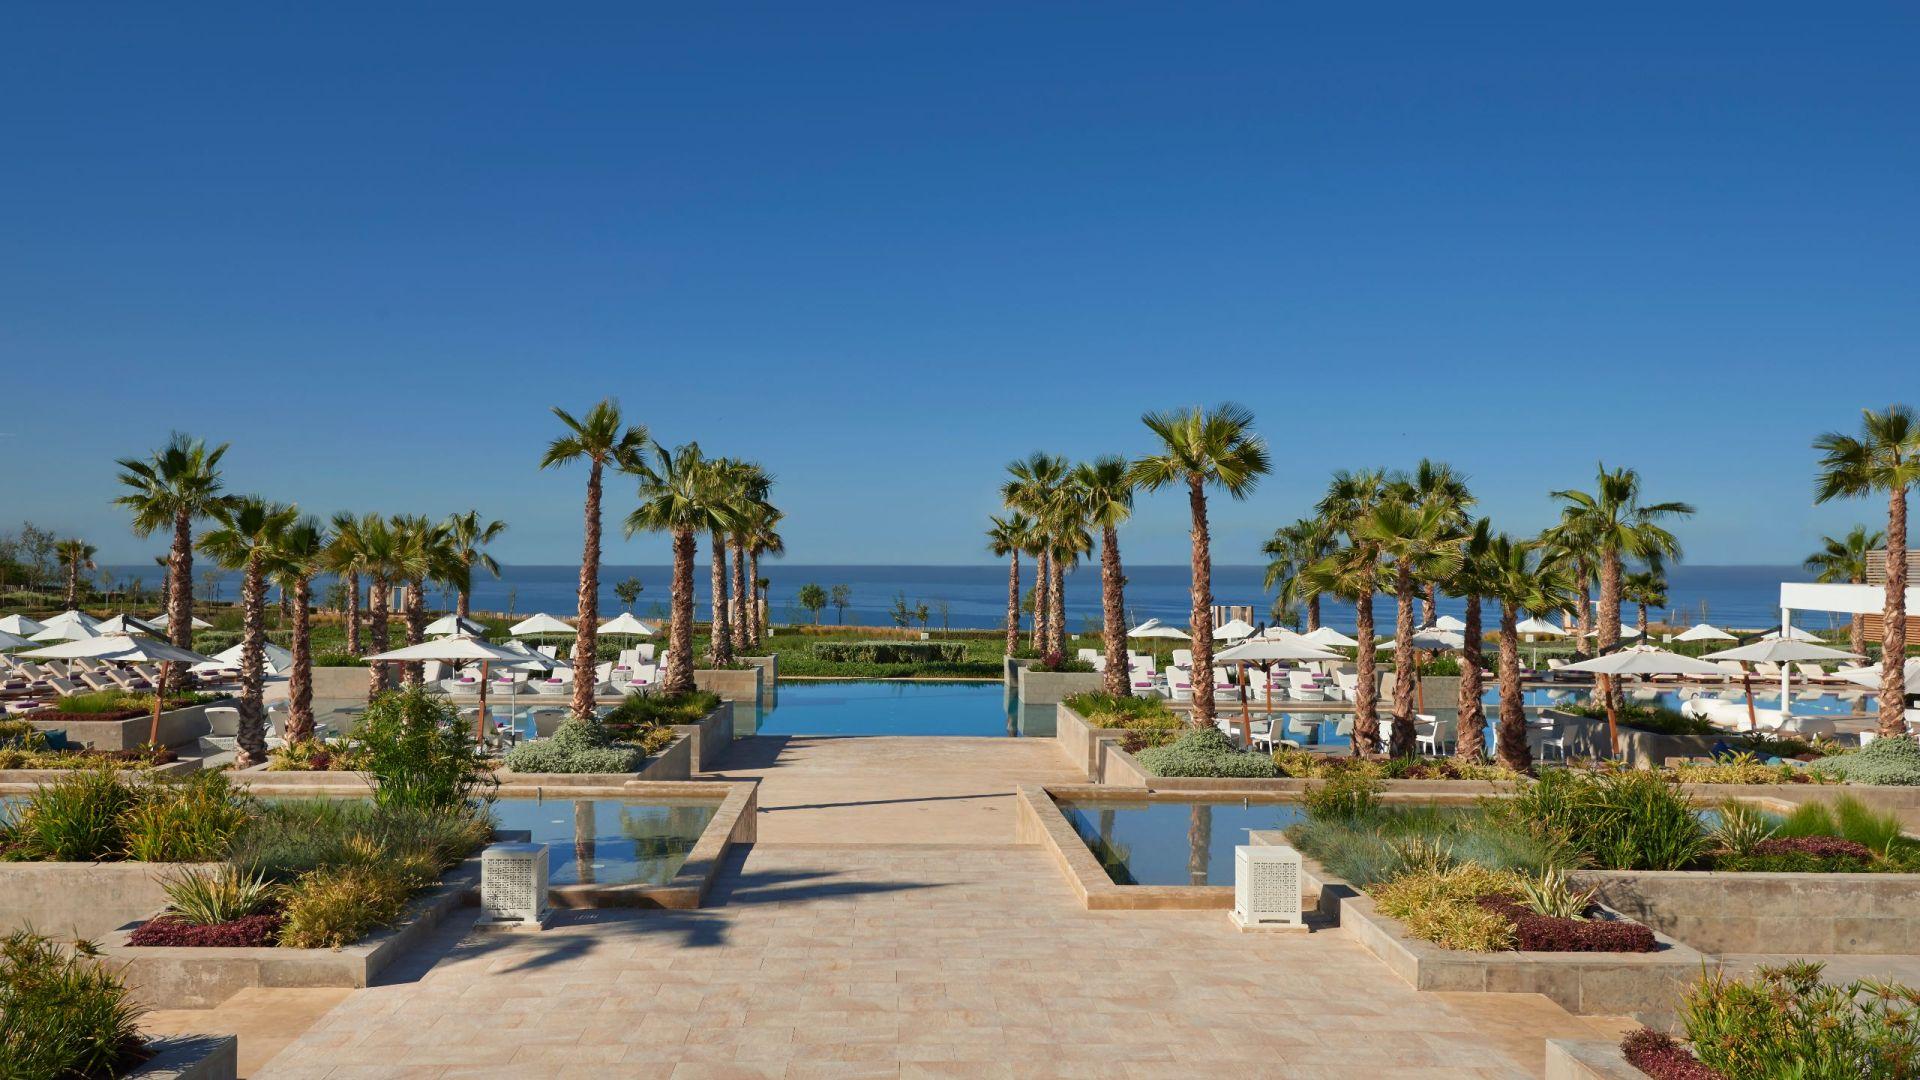 Resort Hotel near Agadir - Hyatt Place Taghazout Hotel